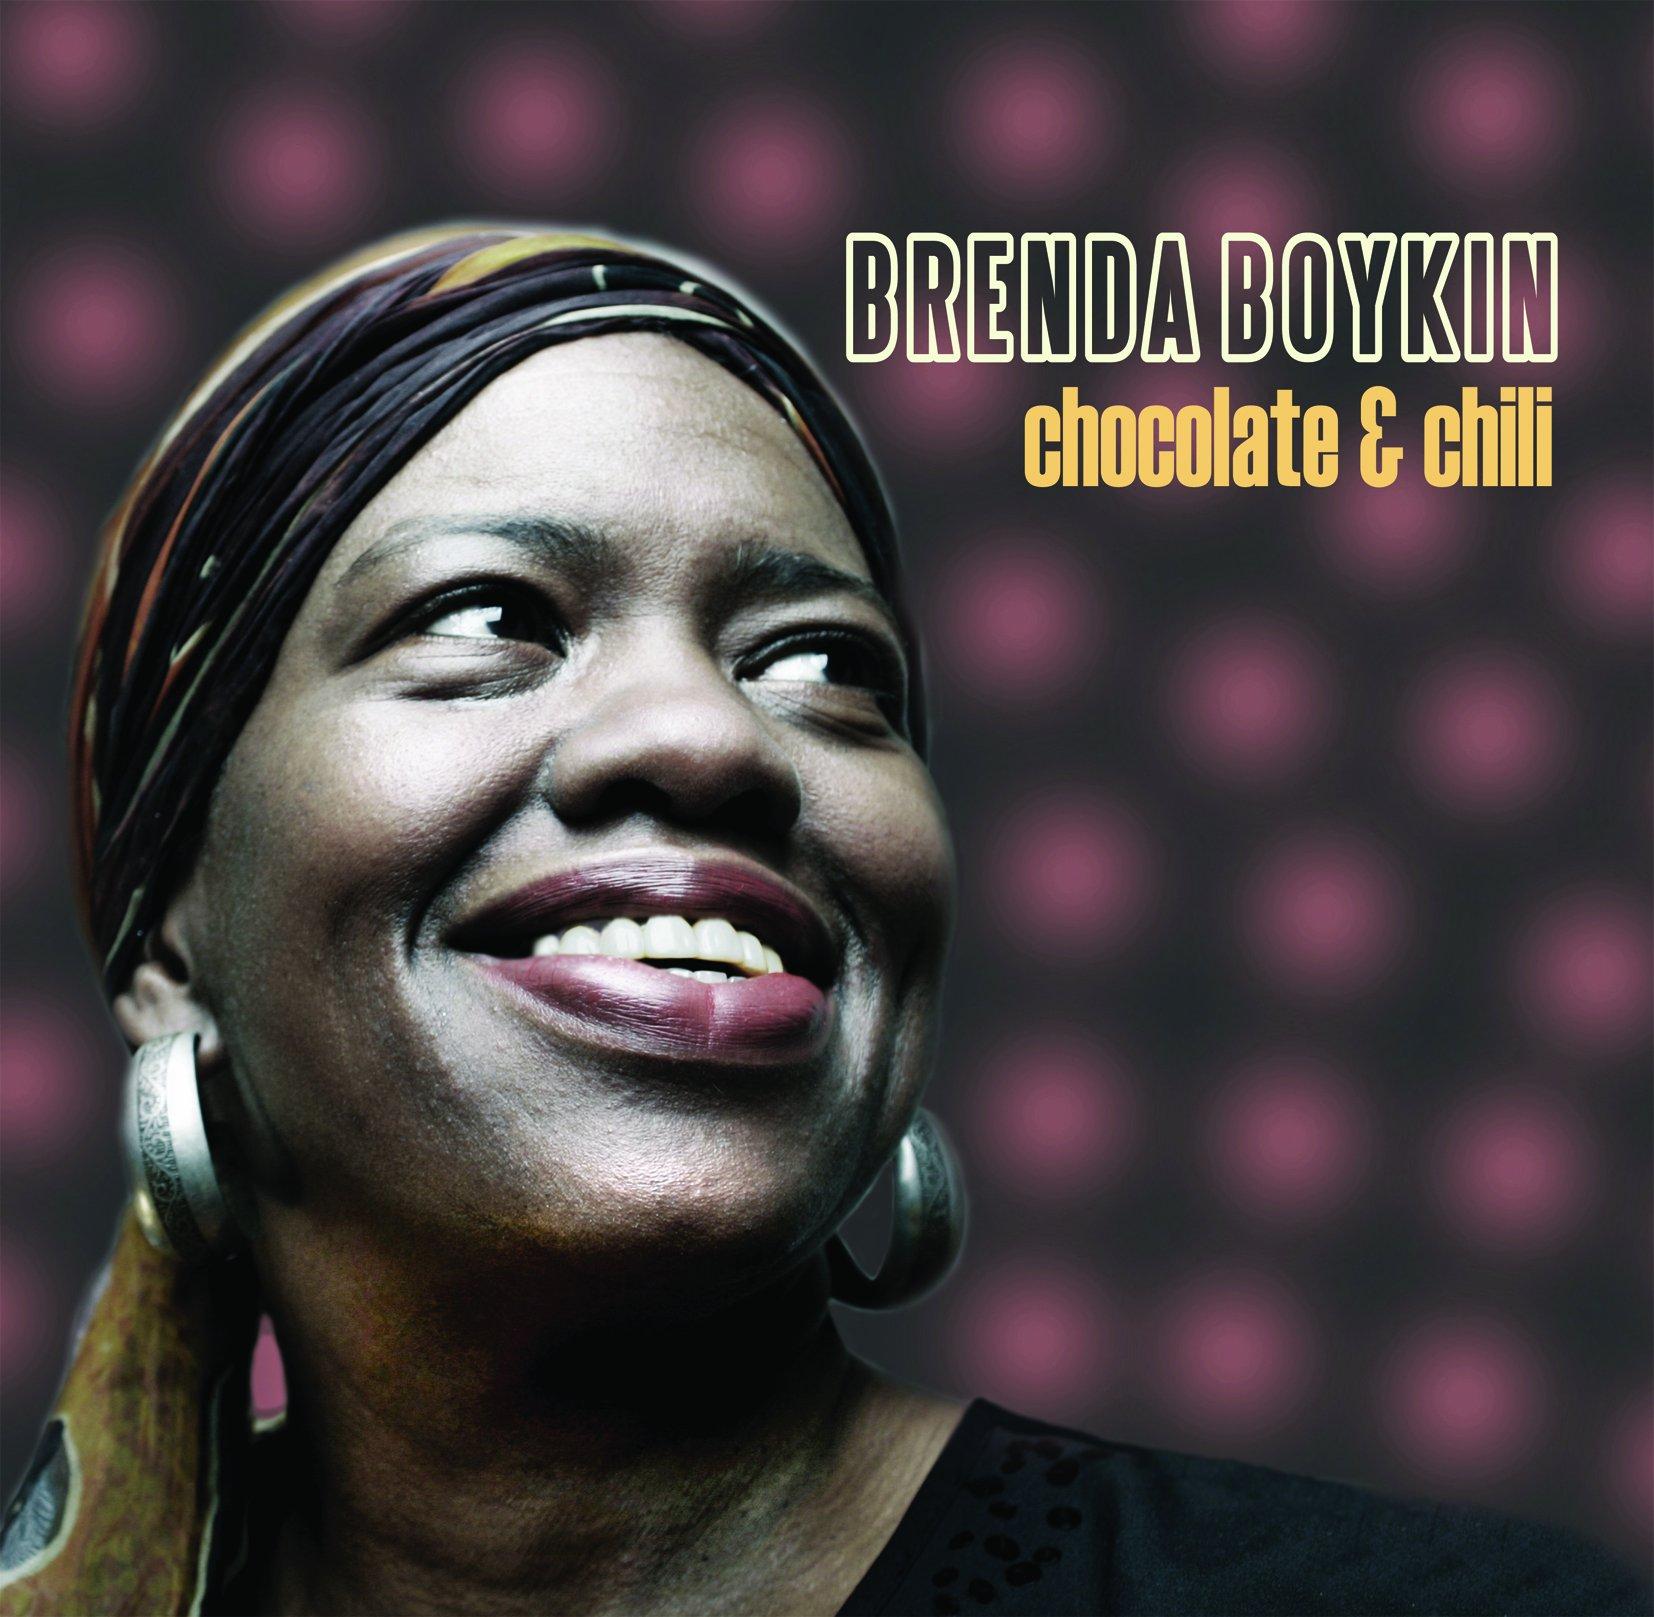 Brenda Boykin - Chocolate & Chili (2008) [FLAC] Download